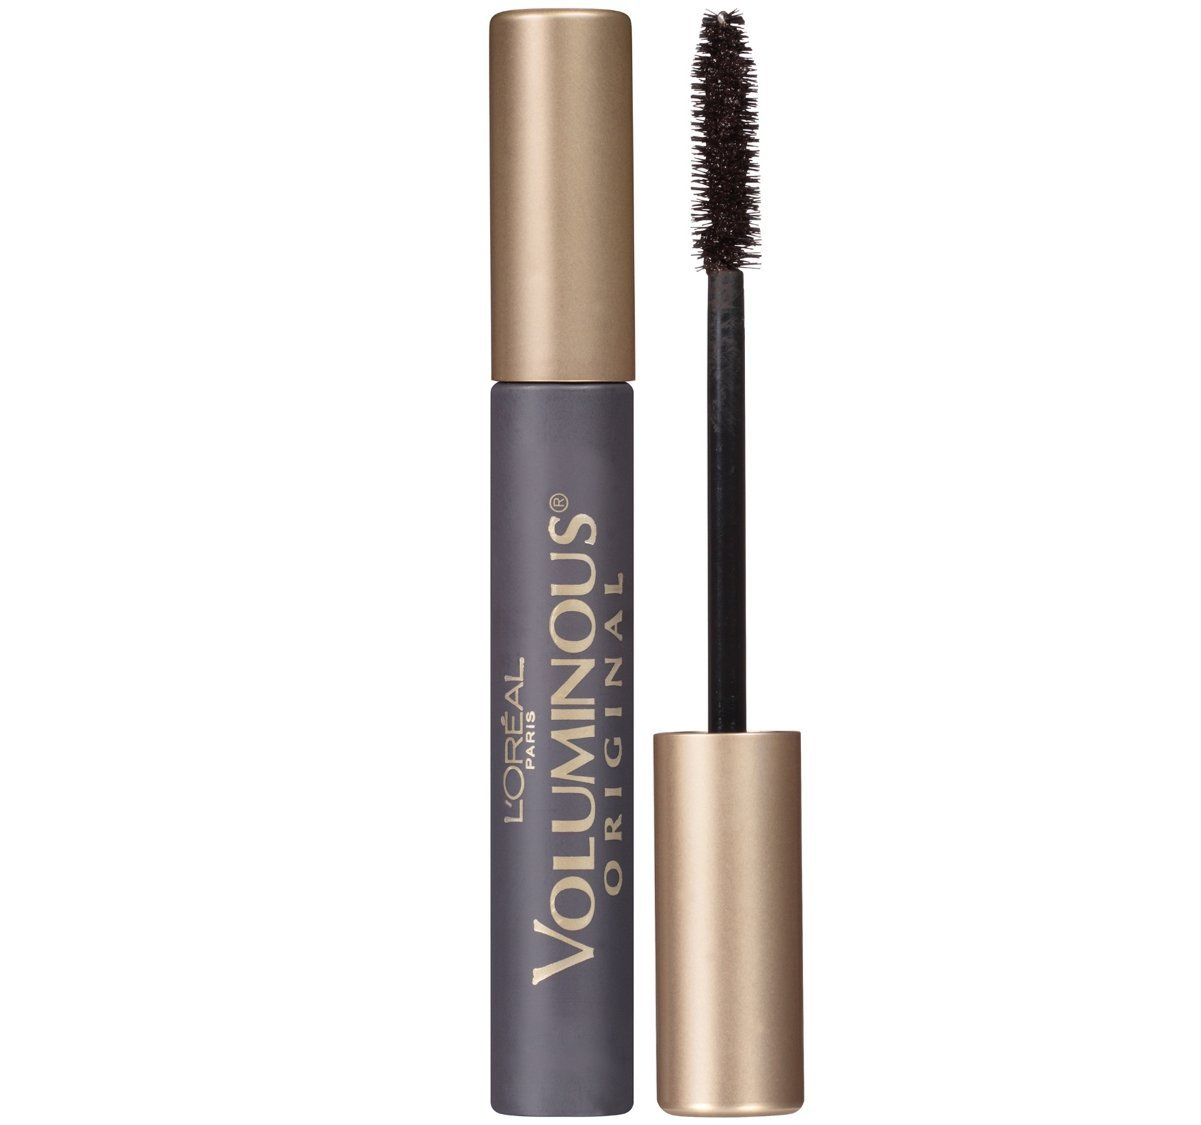 L'Oréal Paris Makeup Voluminous Original Mascara, Black Brown, 0.28 fl. oz.